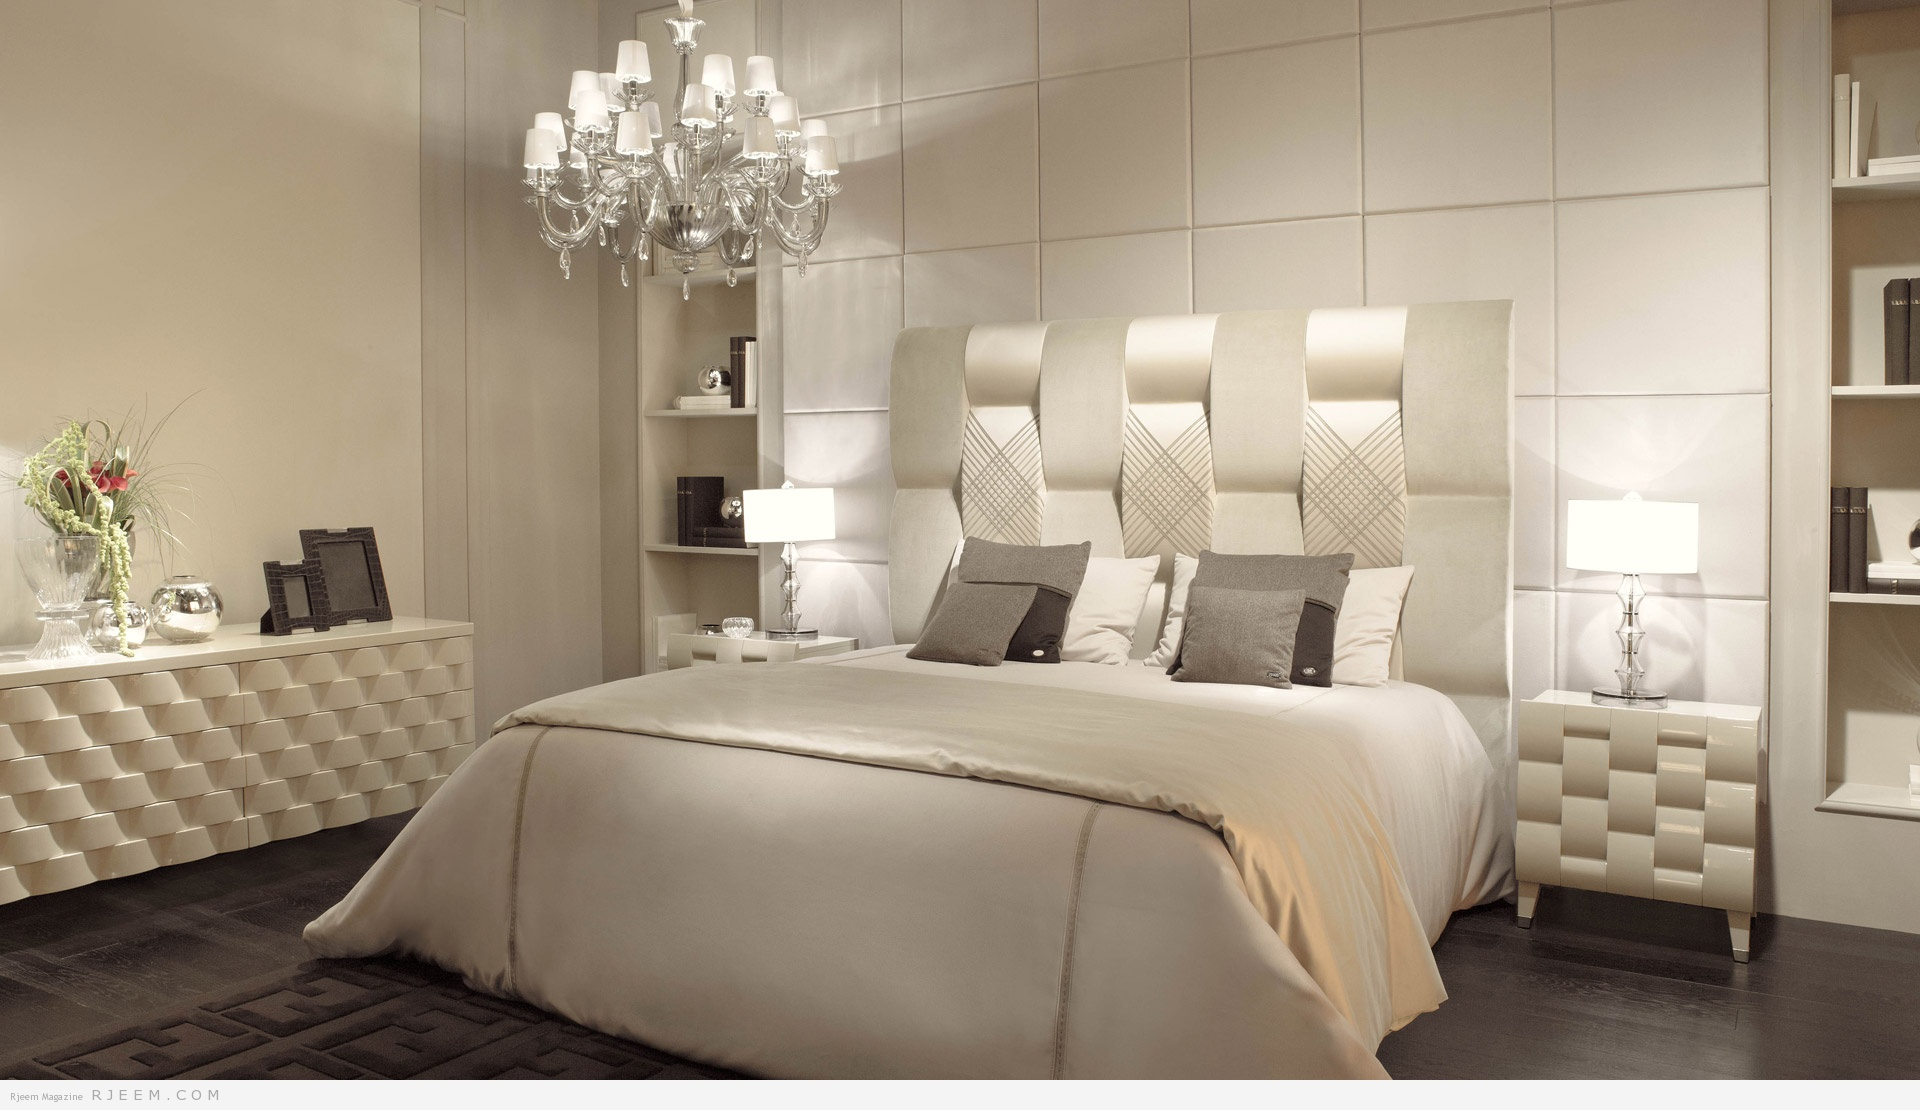 بالصور ديكورات غرف نوم 2019 , ديكور رائع لغرفة اروع 388 12